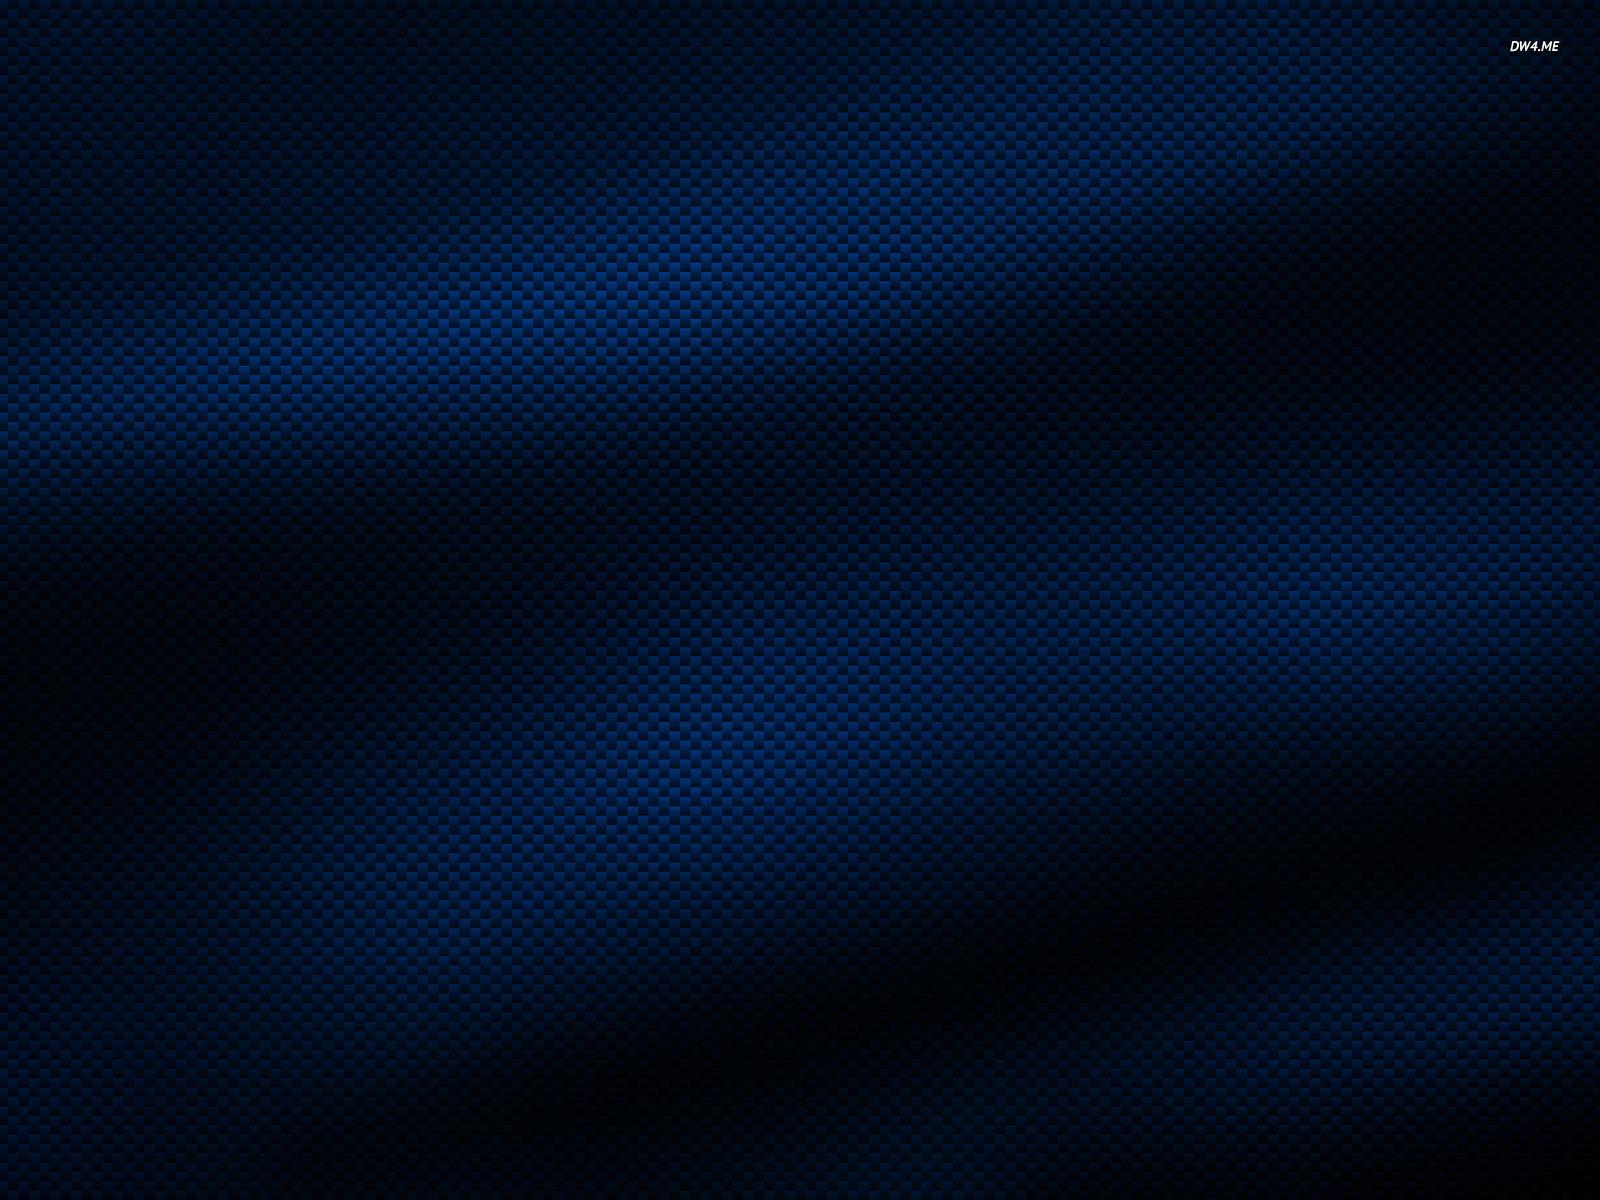 Carbon fiber fabric wallpaper   Abstract wallpapers   869 1600x1200